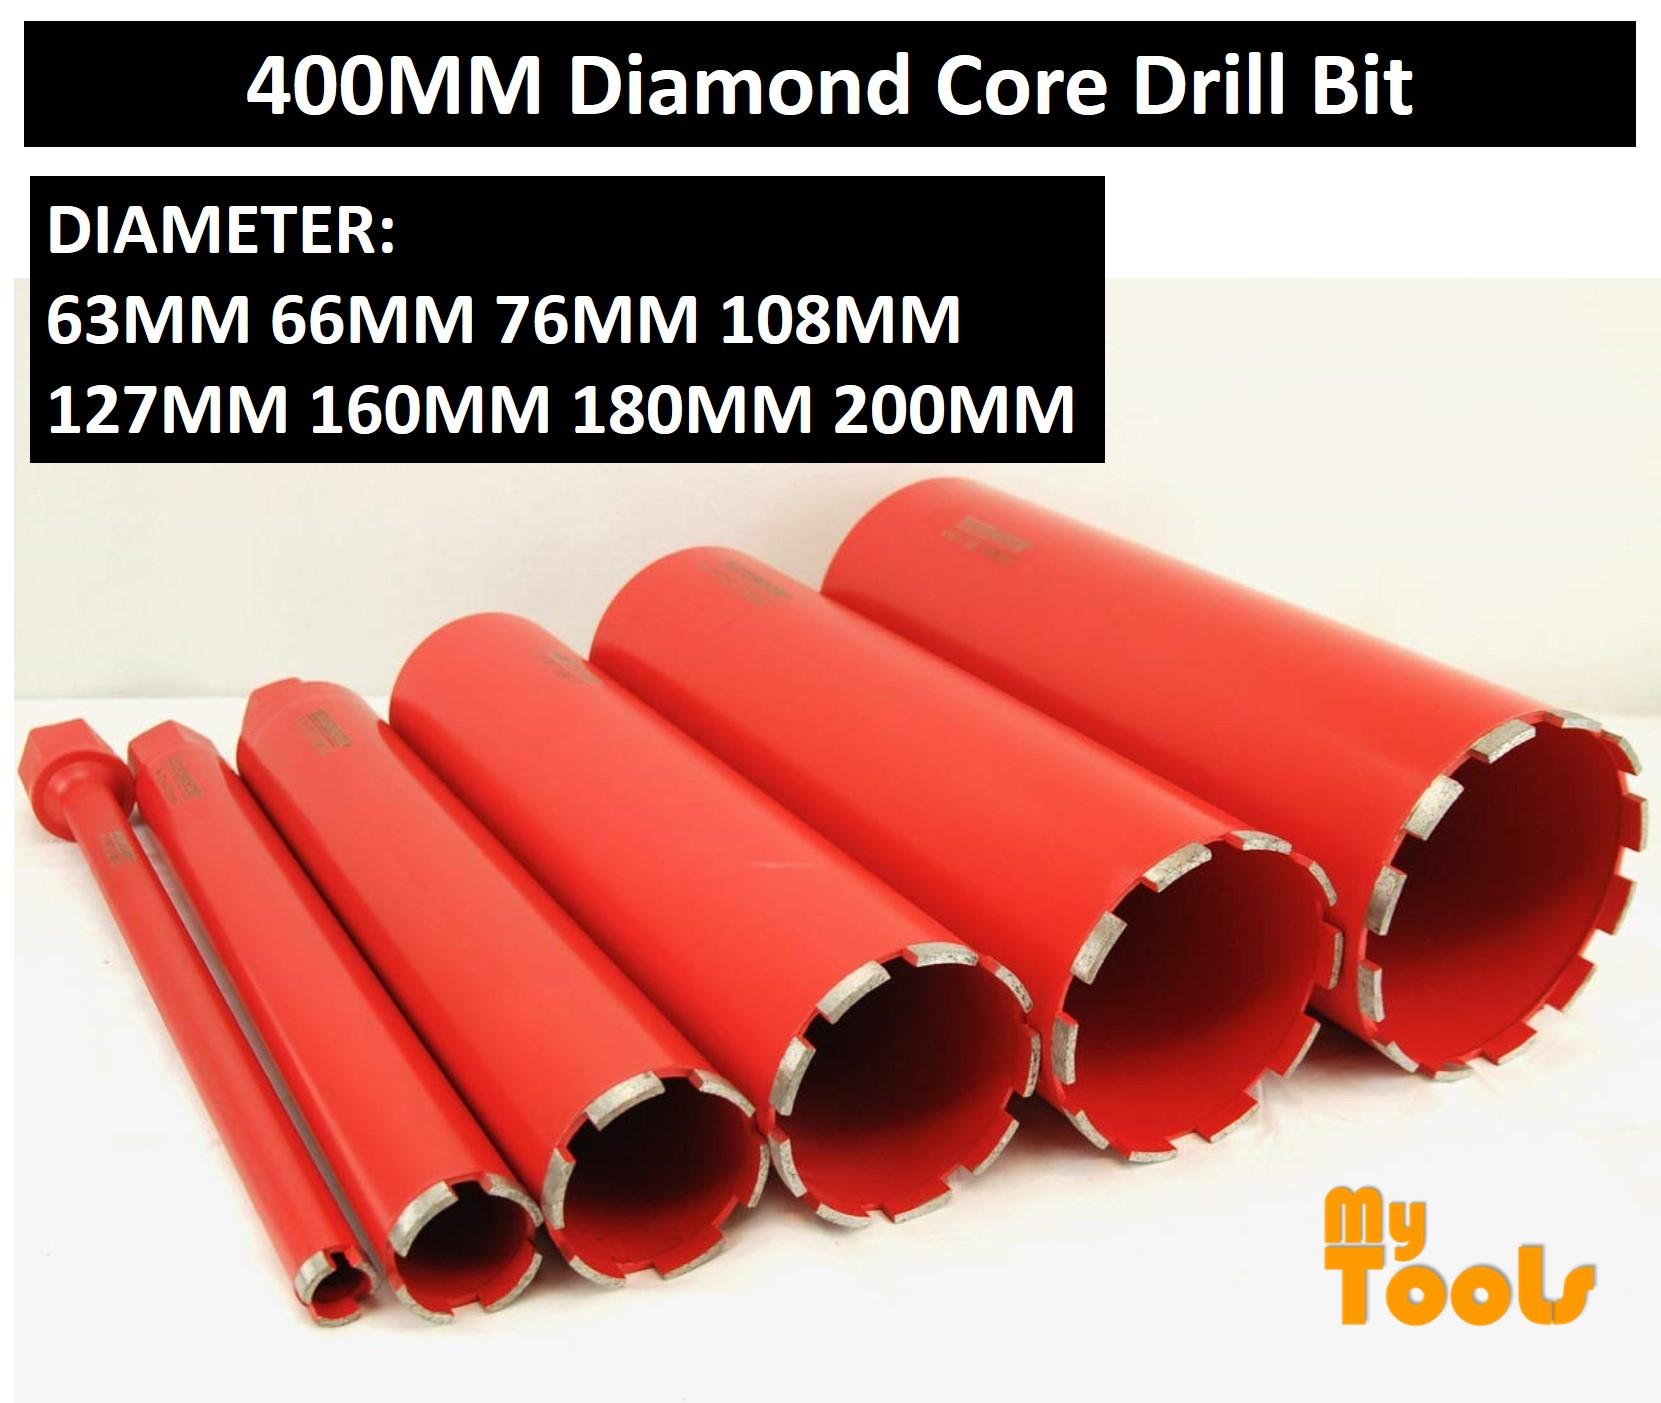 63MM 66MM 76MM 108MM 127MM 160MM 180MM 200MM x 400MM Diamond Core Drill Bit / Diamond Coring Drilling Bit For Concrete / Masonry / Brick / Stone / Rock